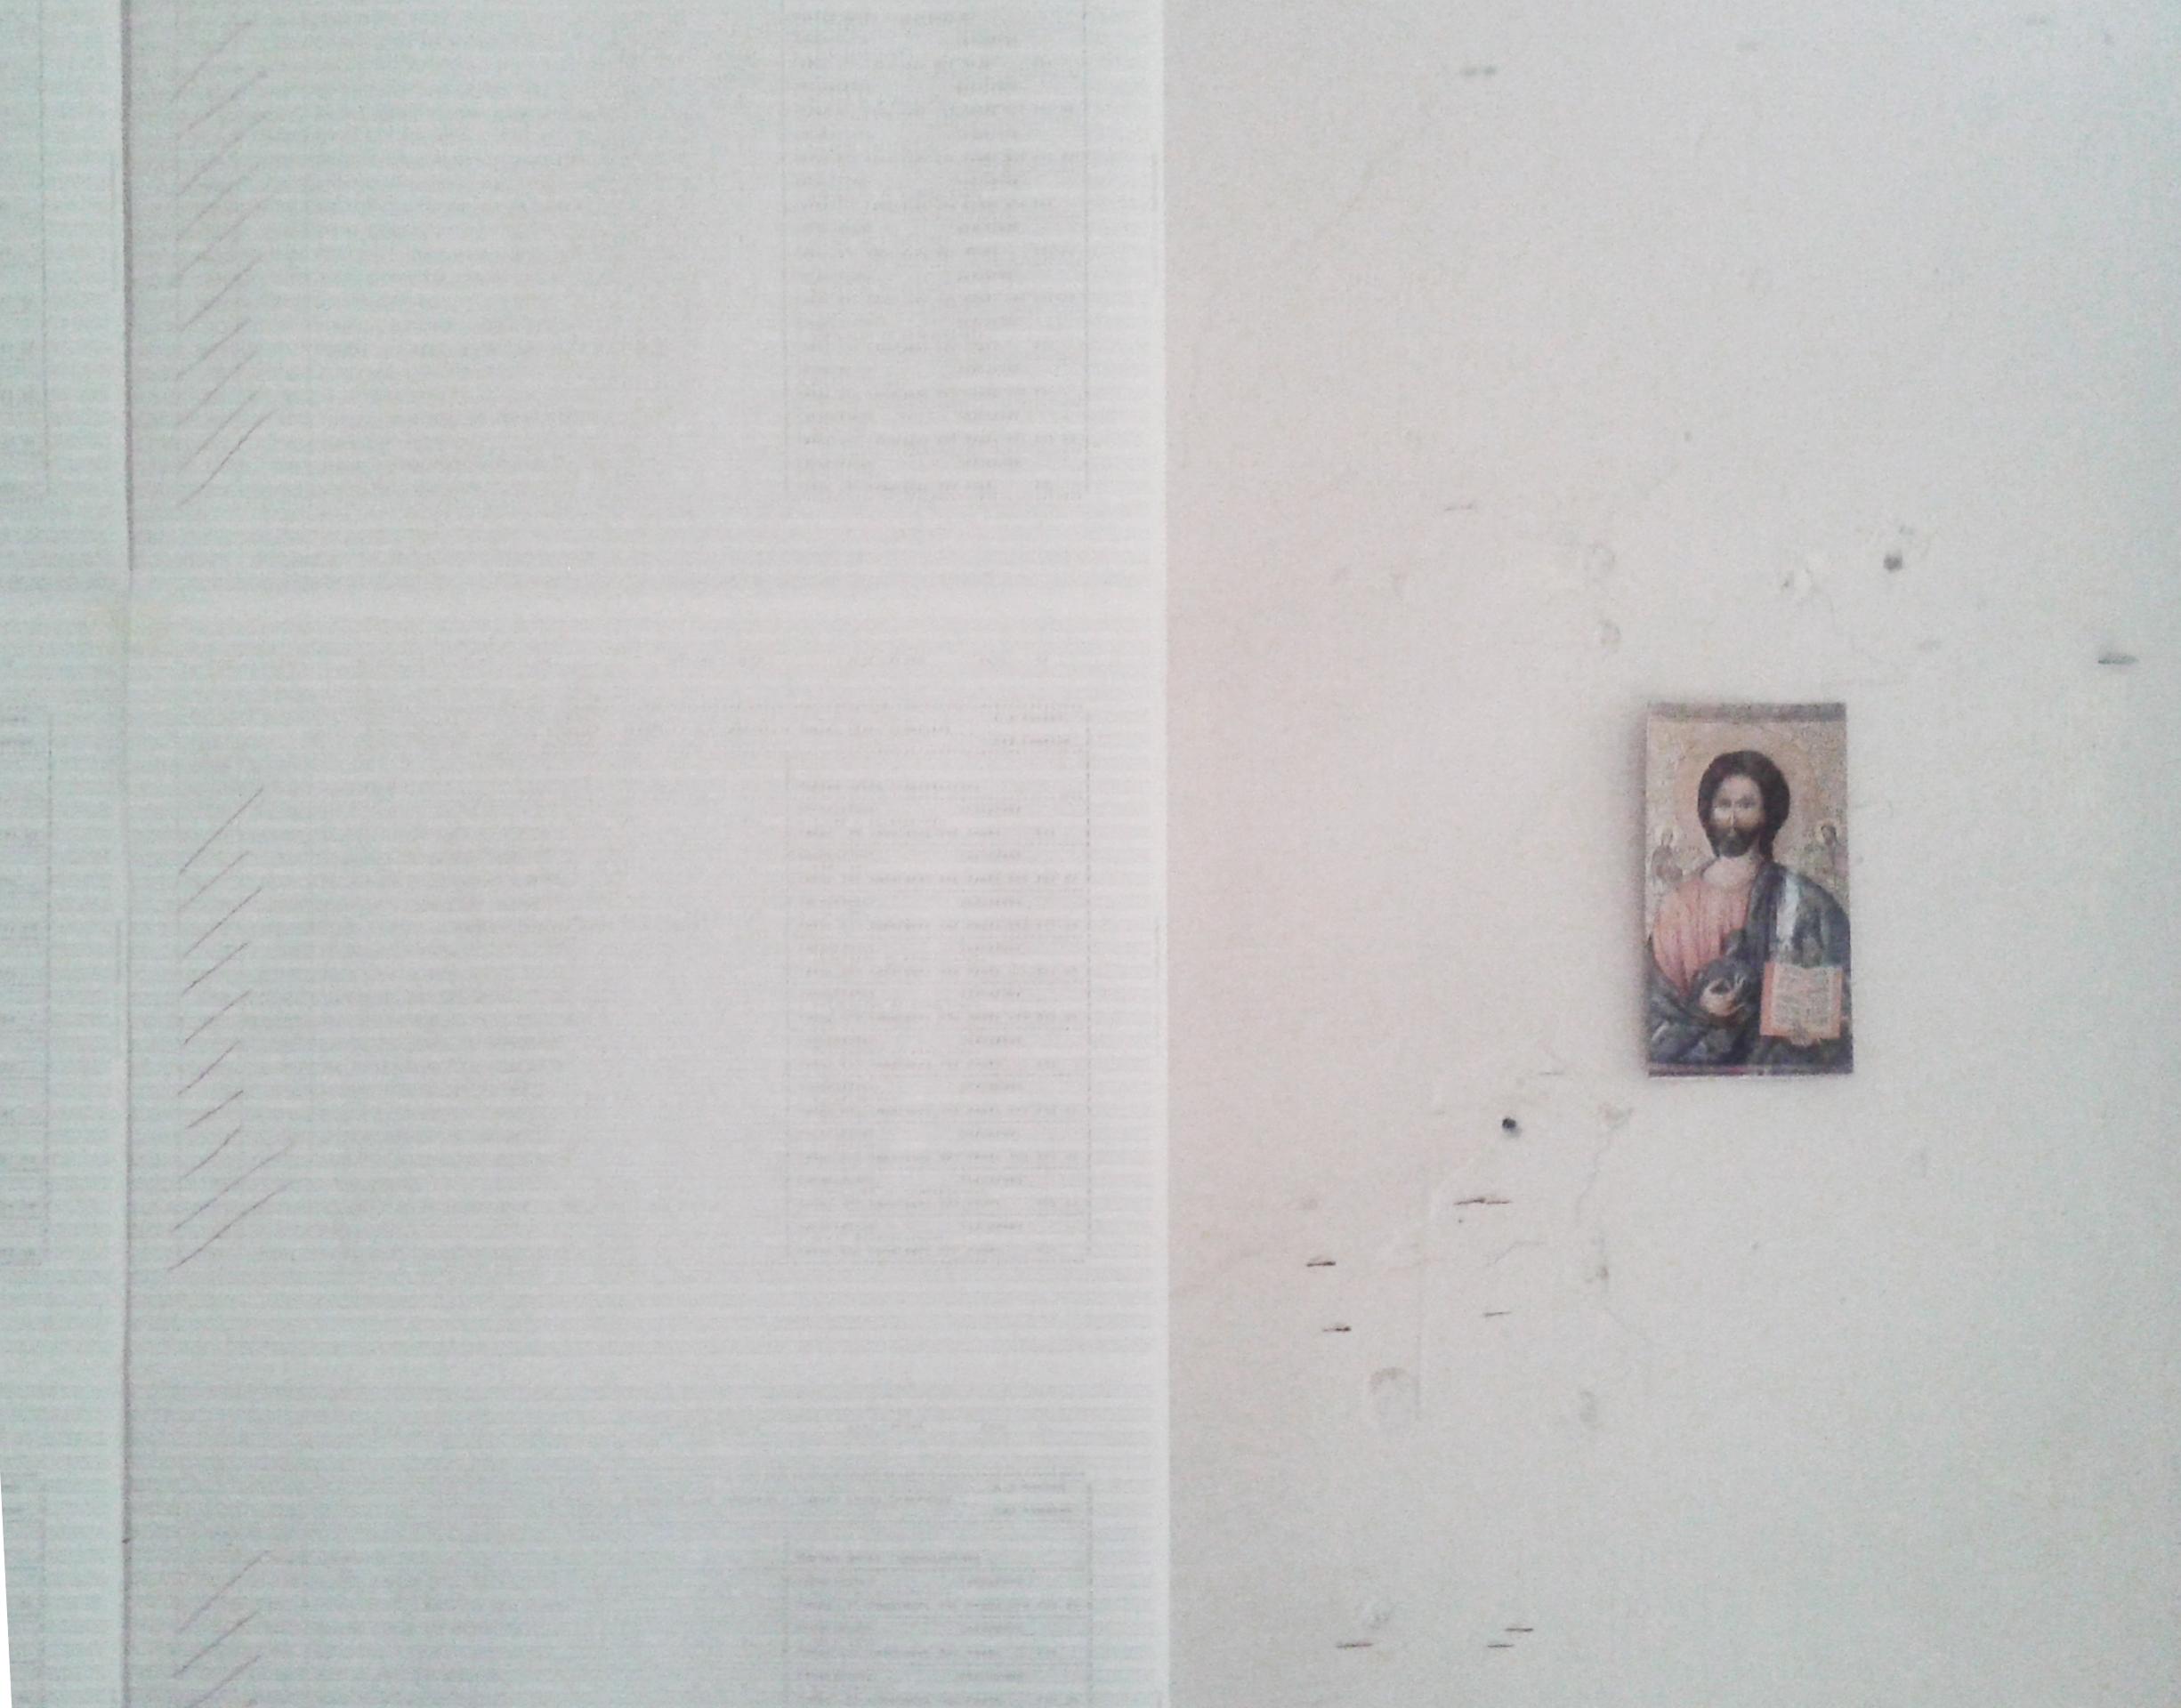 L'estate - Gian Maria Tosatti